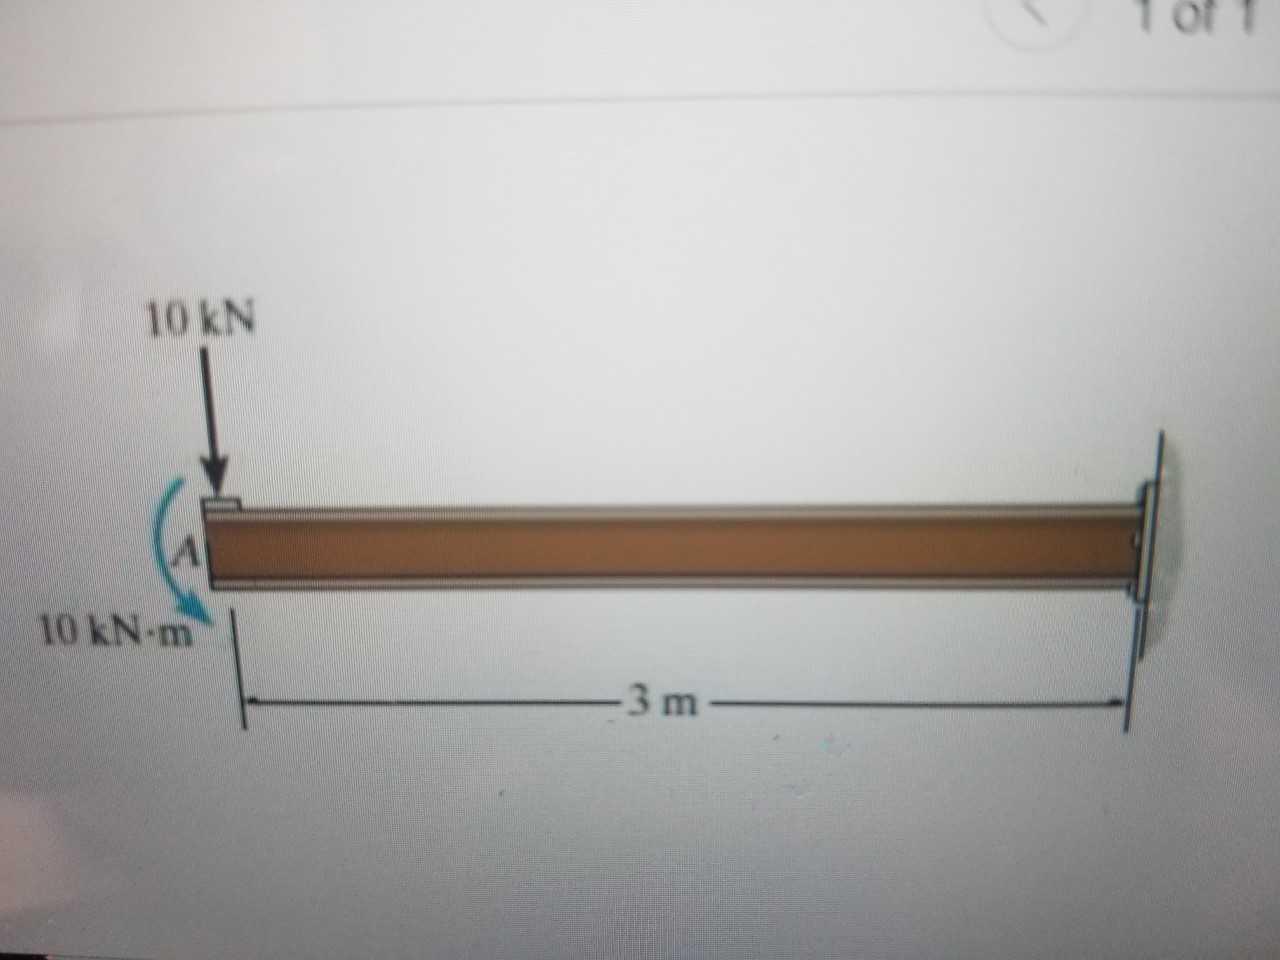 Tof 10 kN 10 kN-m